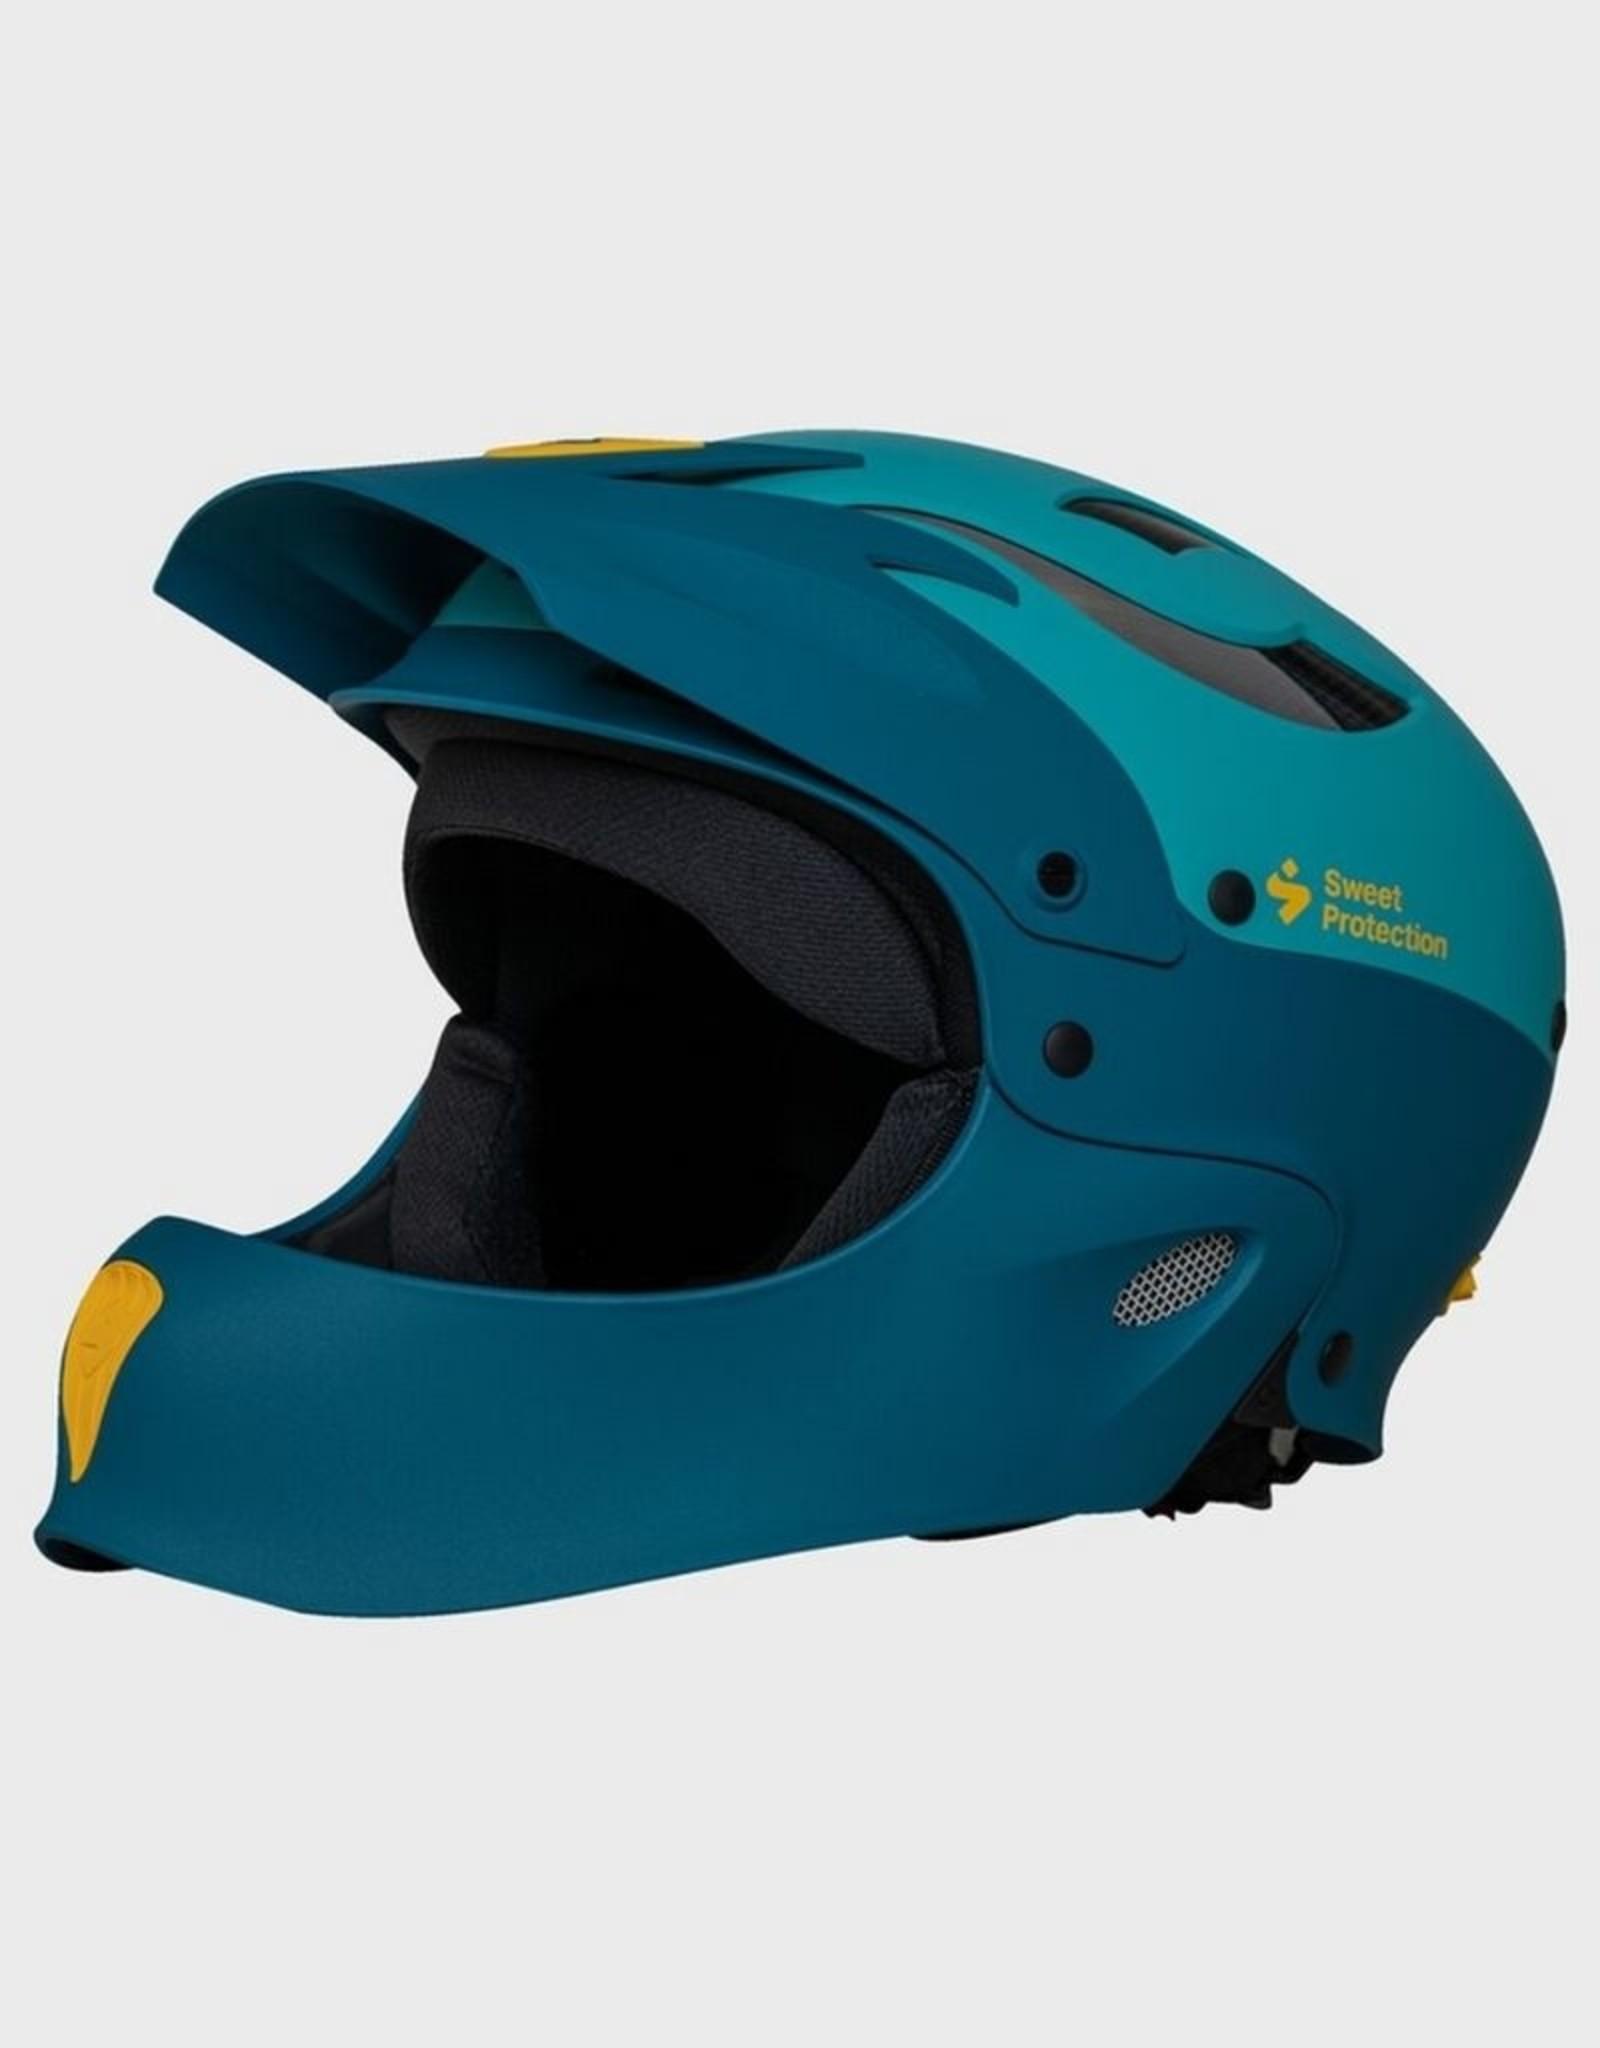 Sweet Protection Sweet Protection Rocker Full Face Helmet